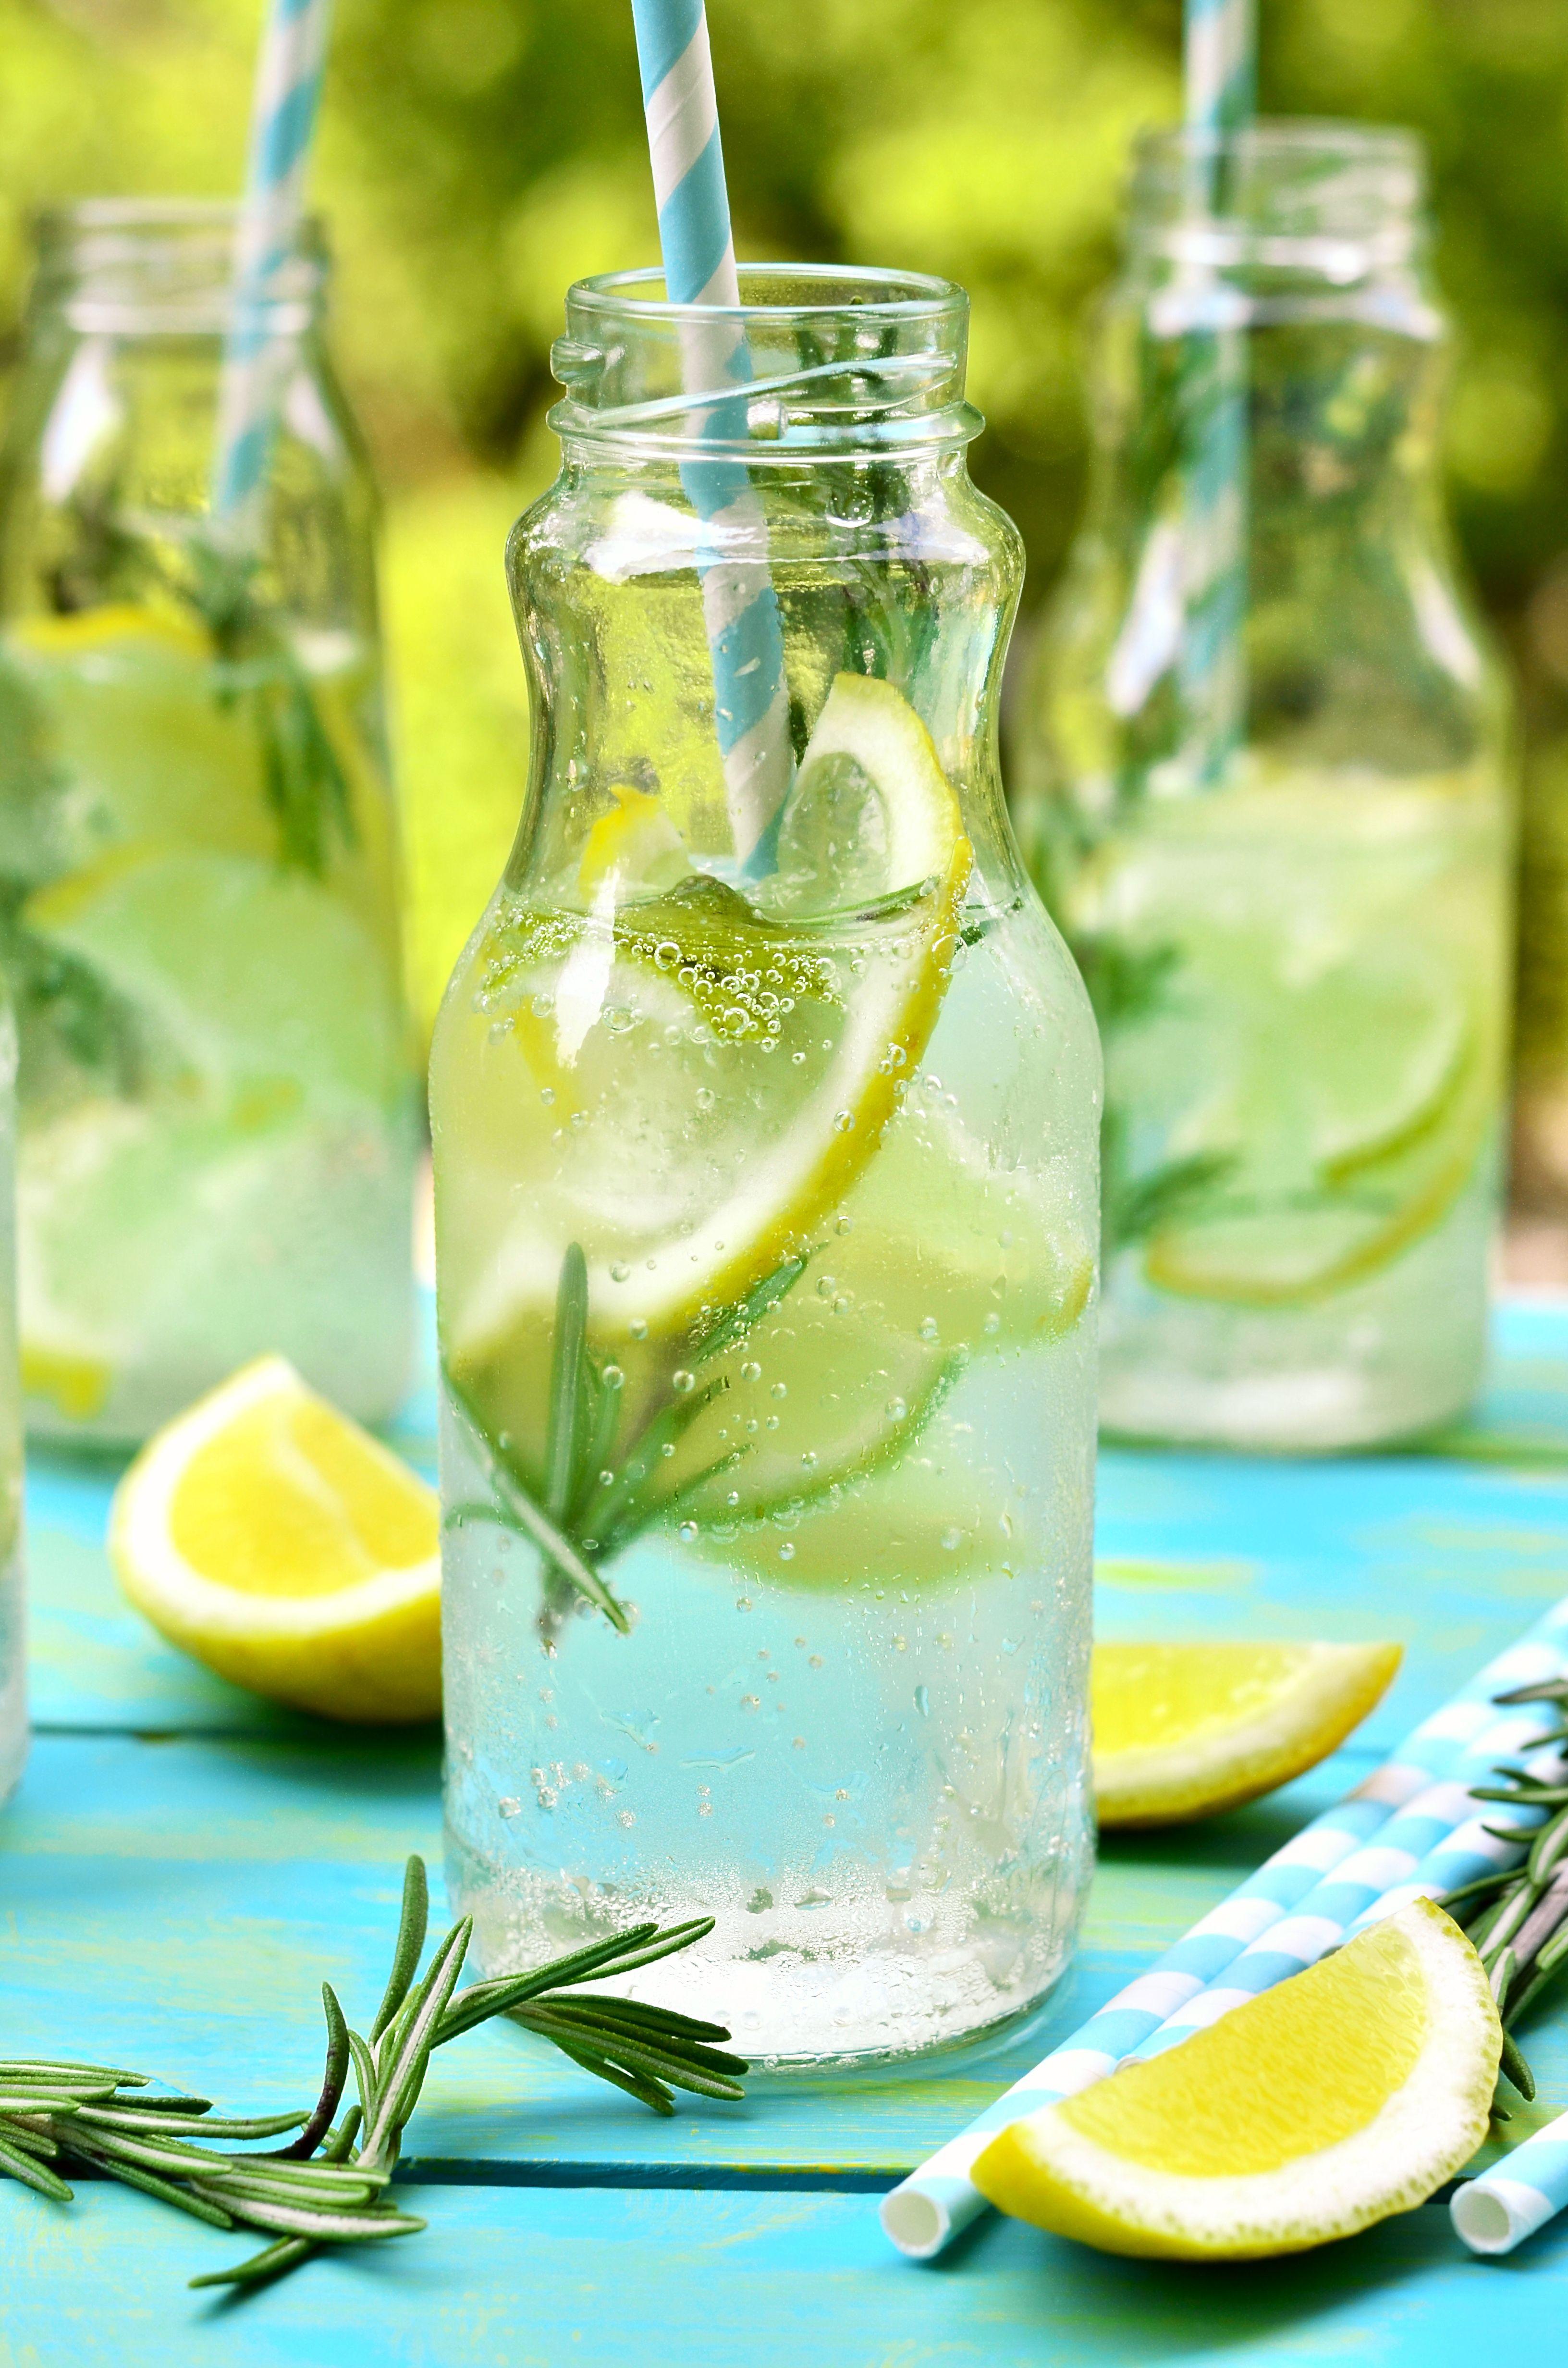 Limonade selber machen: 4 Trend-Rezepte mit Zitrone, Erdbeer oder ...